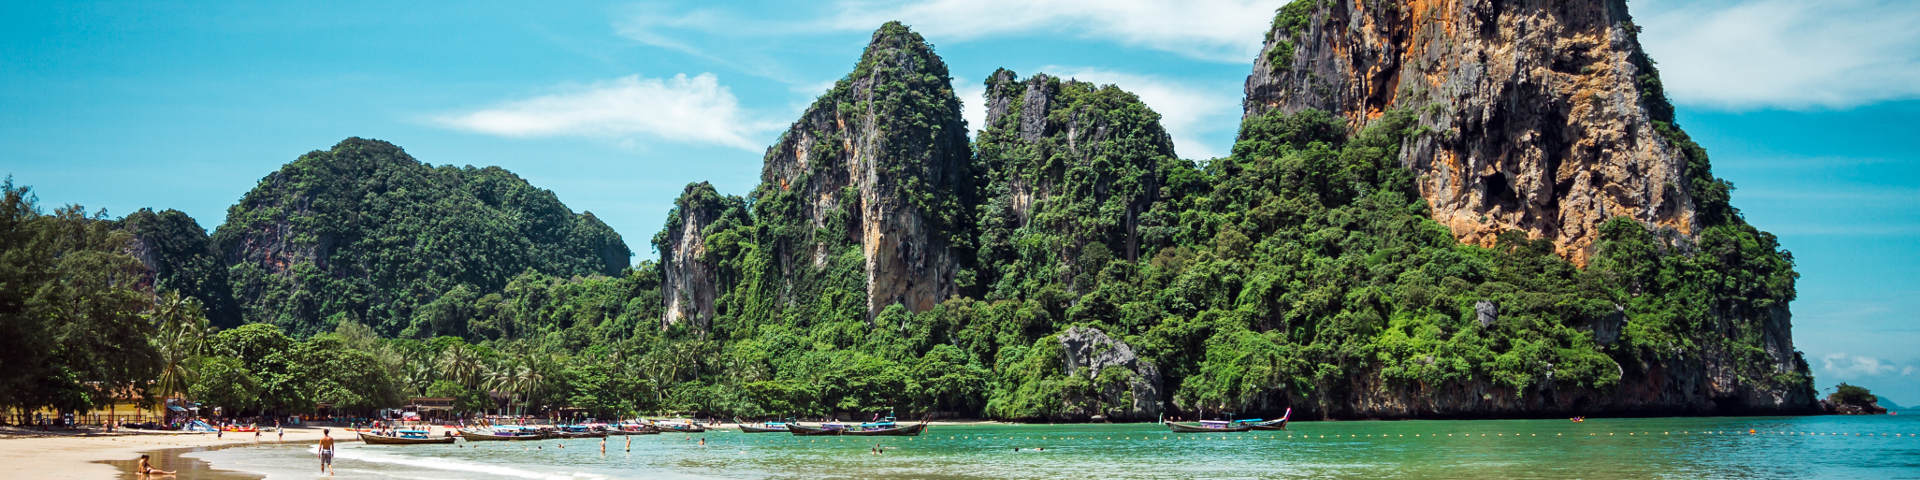 Krabi  thailand   hero1